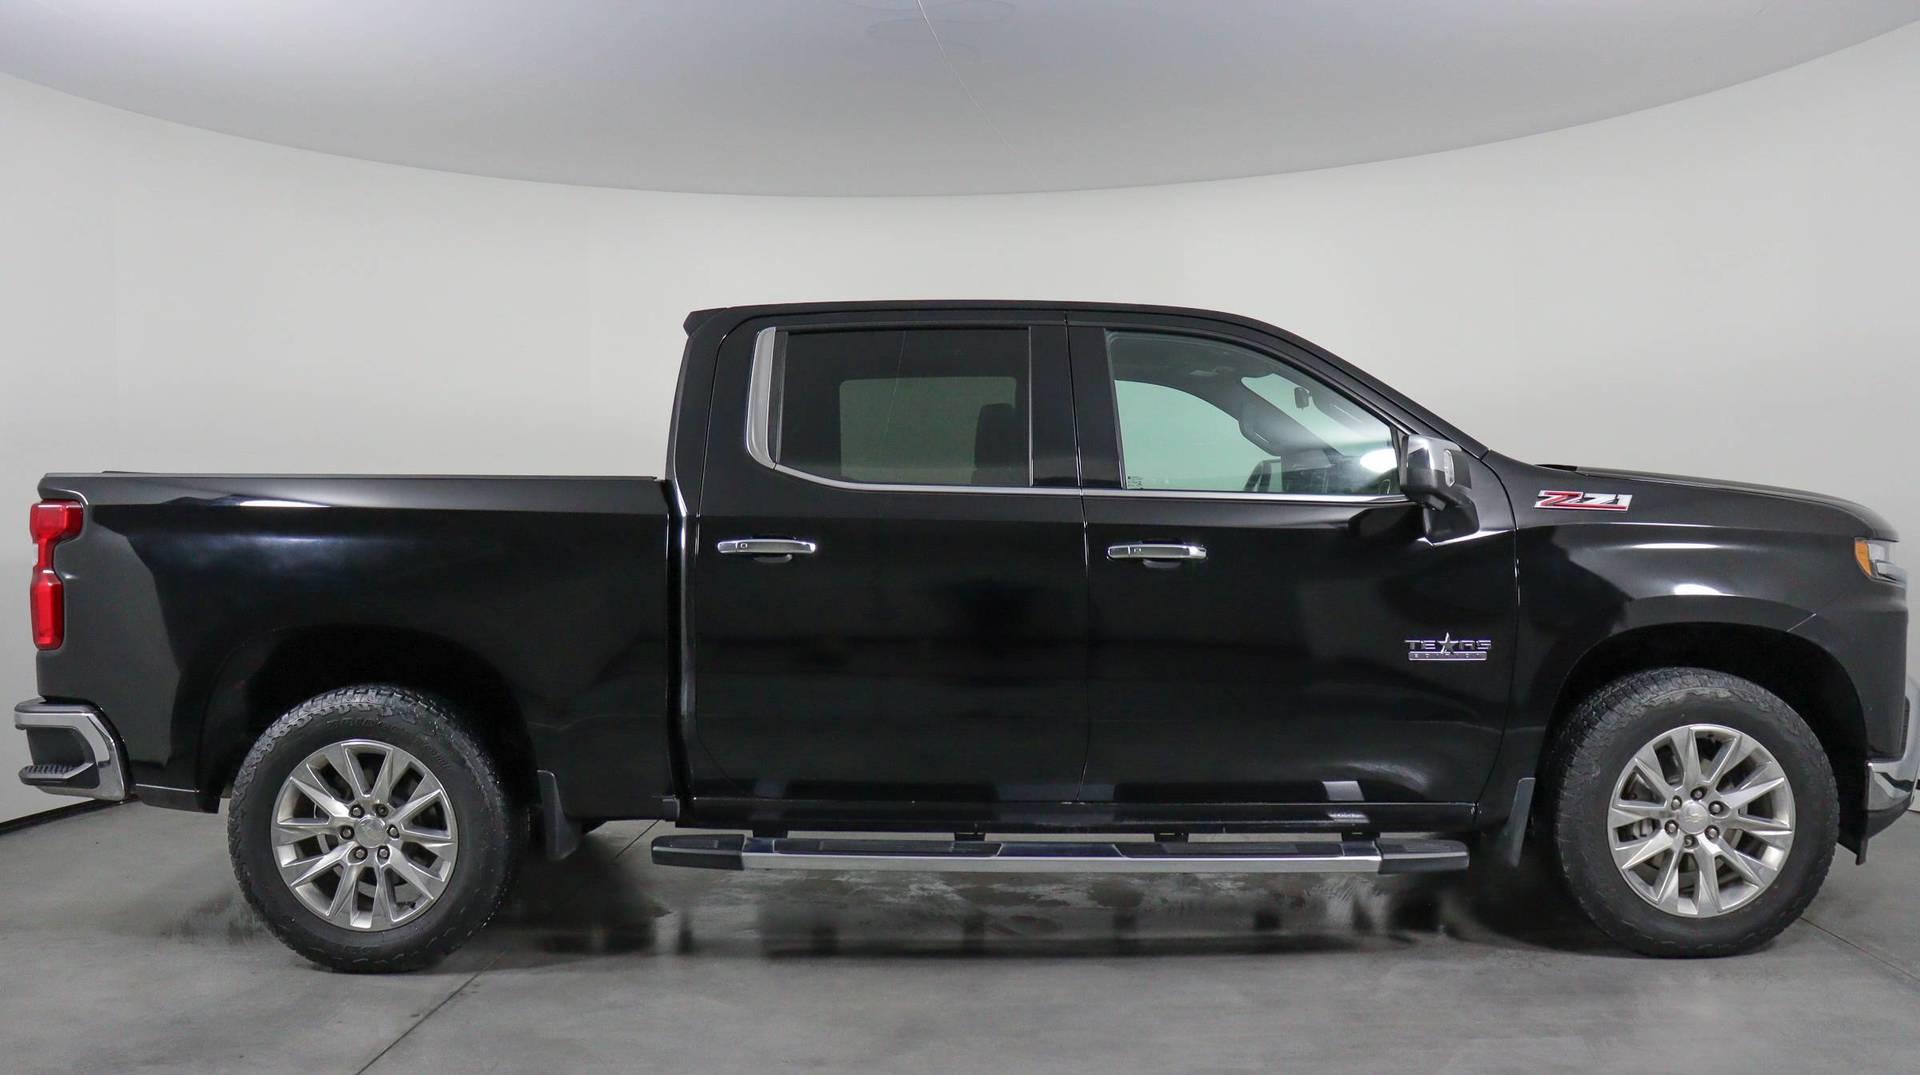 Carvix - Used vehicle - Truck CHEVROLET SILVERADO 1500 2019